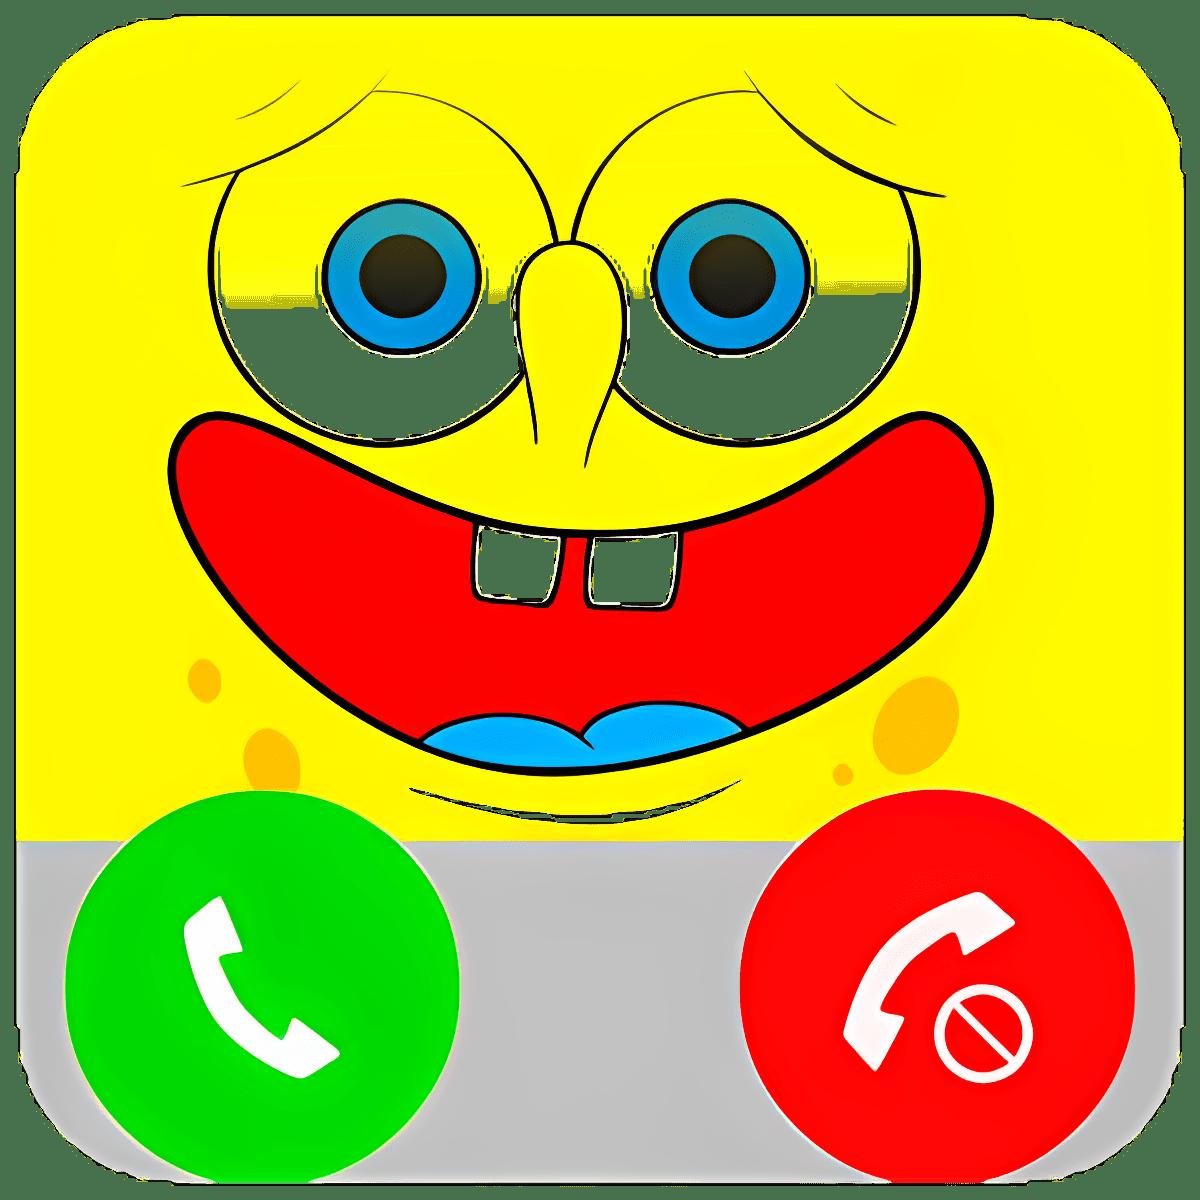 Fake Call From sponge bob